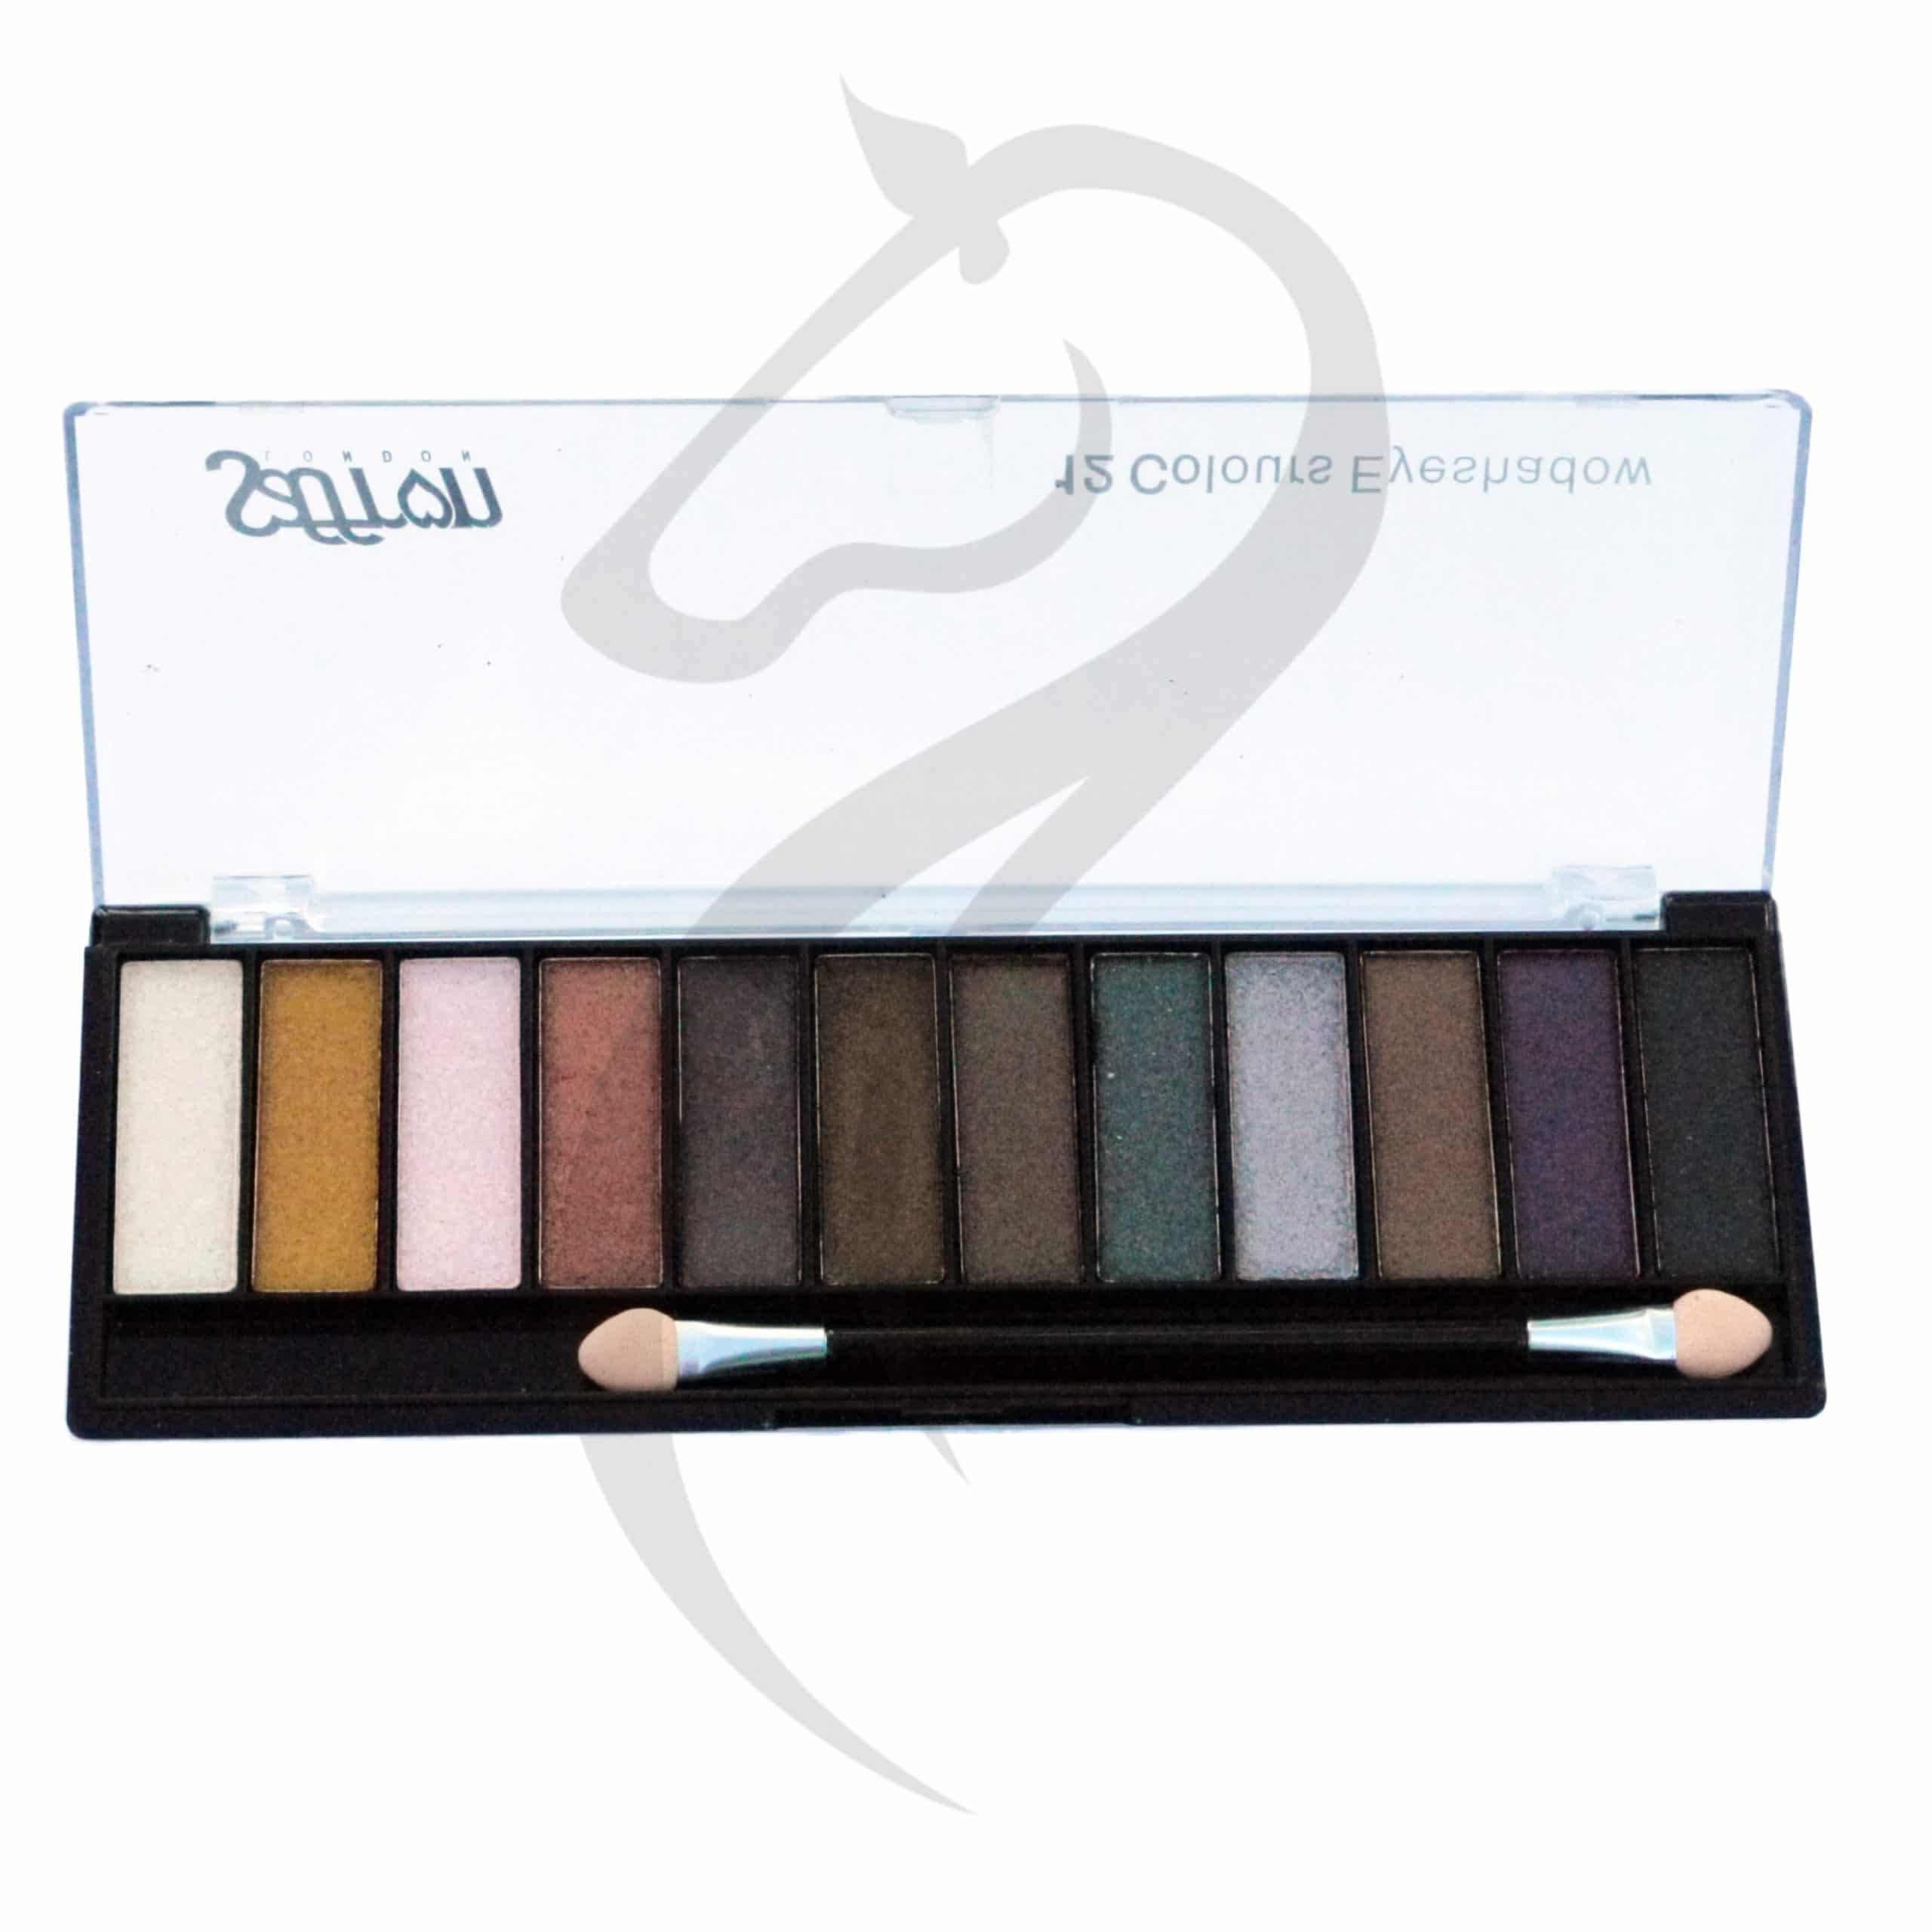 Saffron Simply Nude Eyeshadow Palette